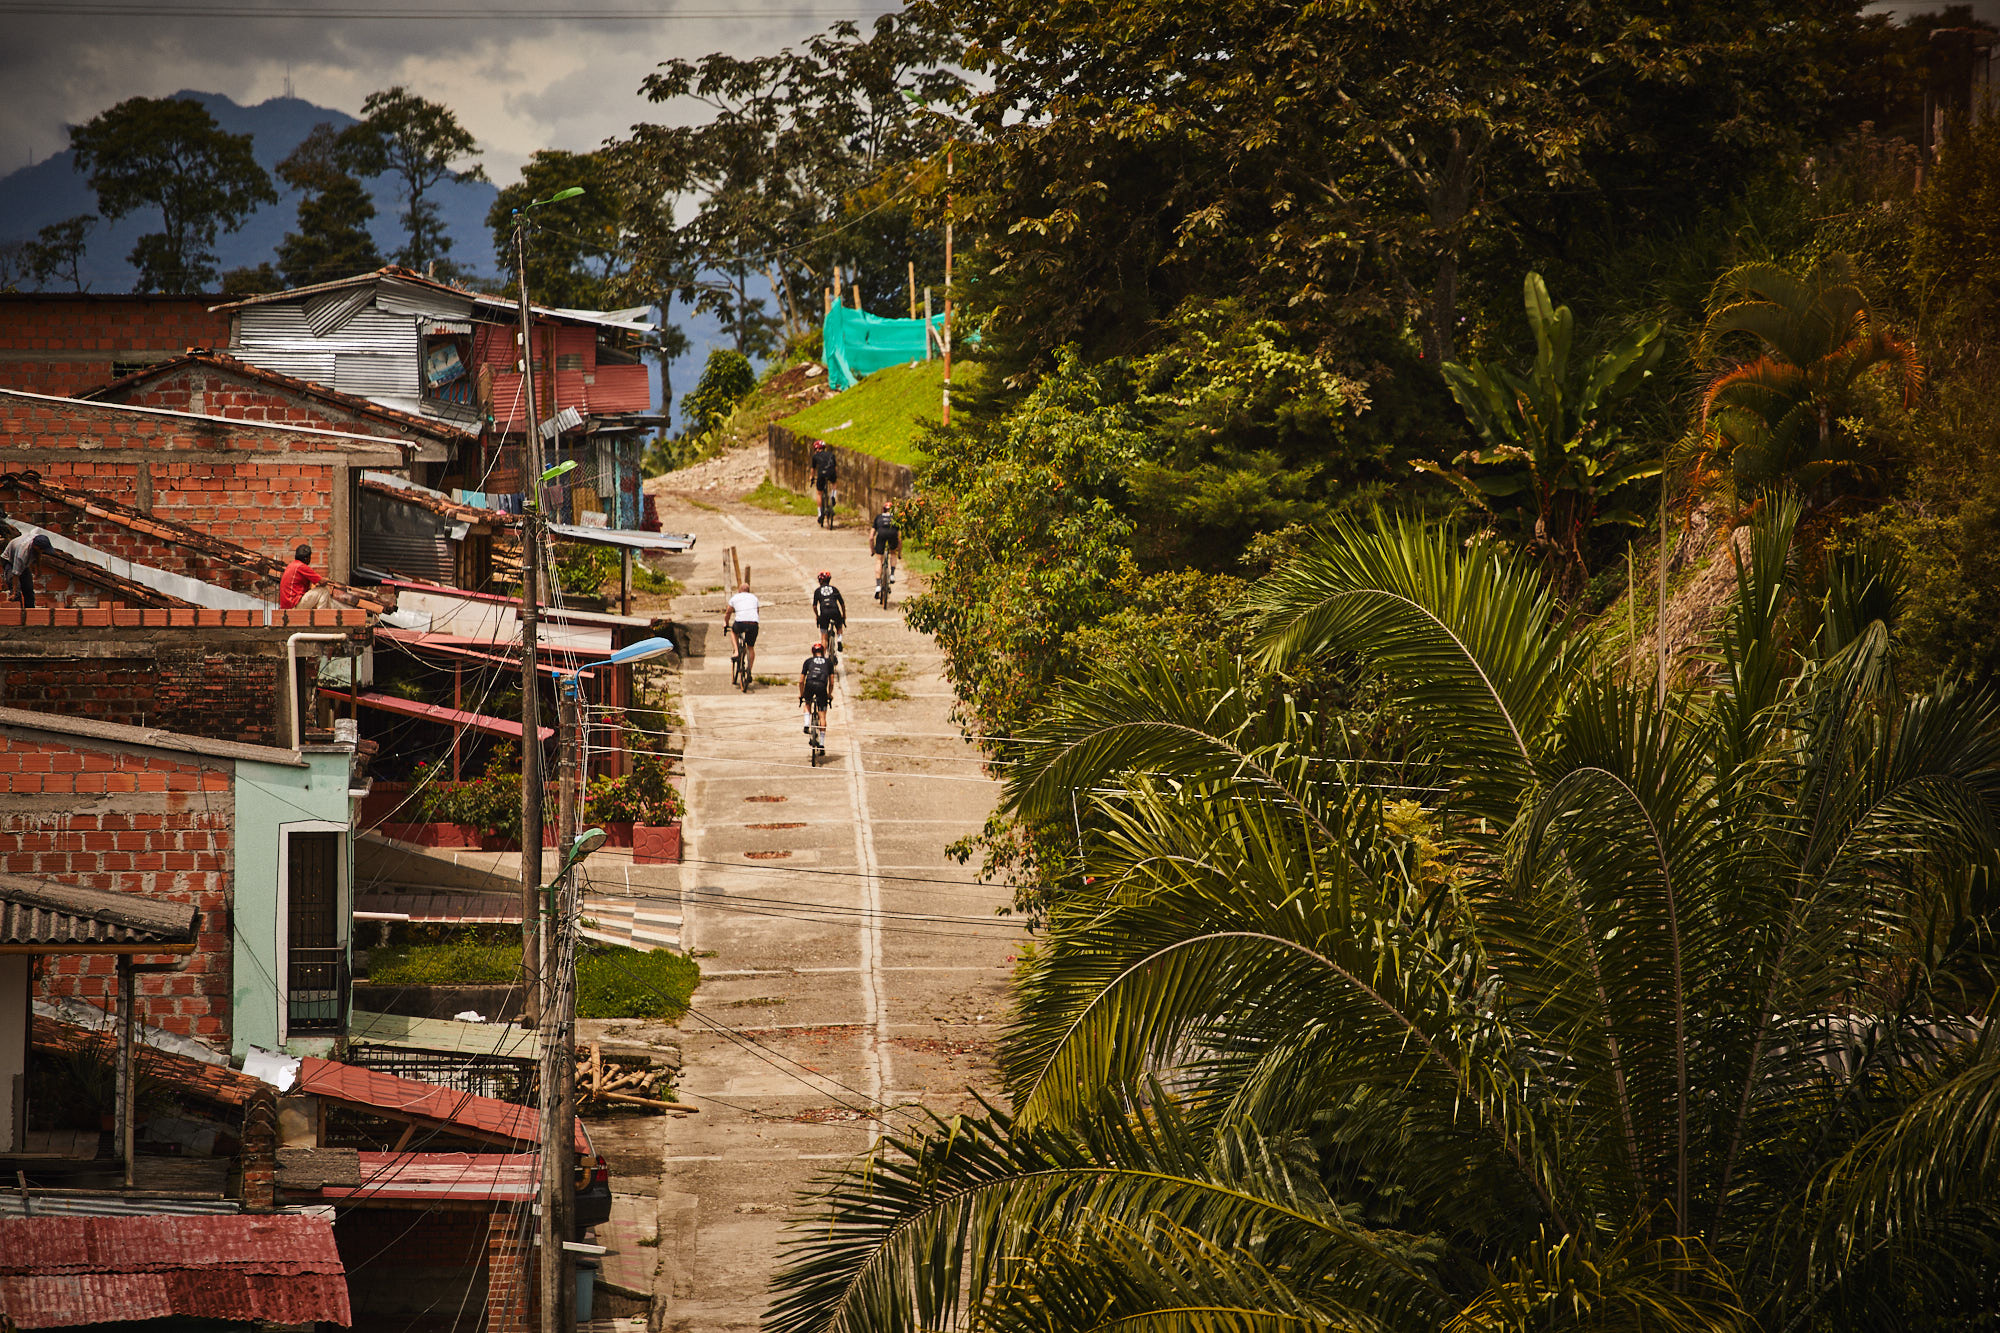 LOWRES-RADRACE-COLUMBIA-2018-CARLOS-3815.jpg